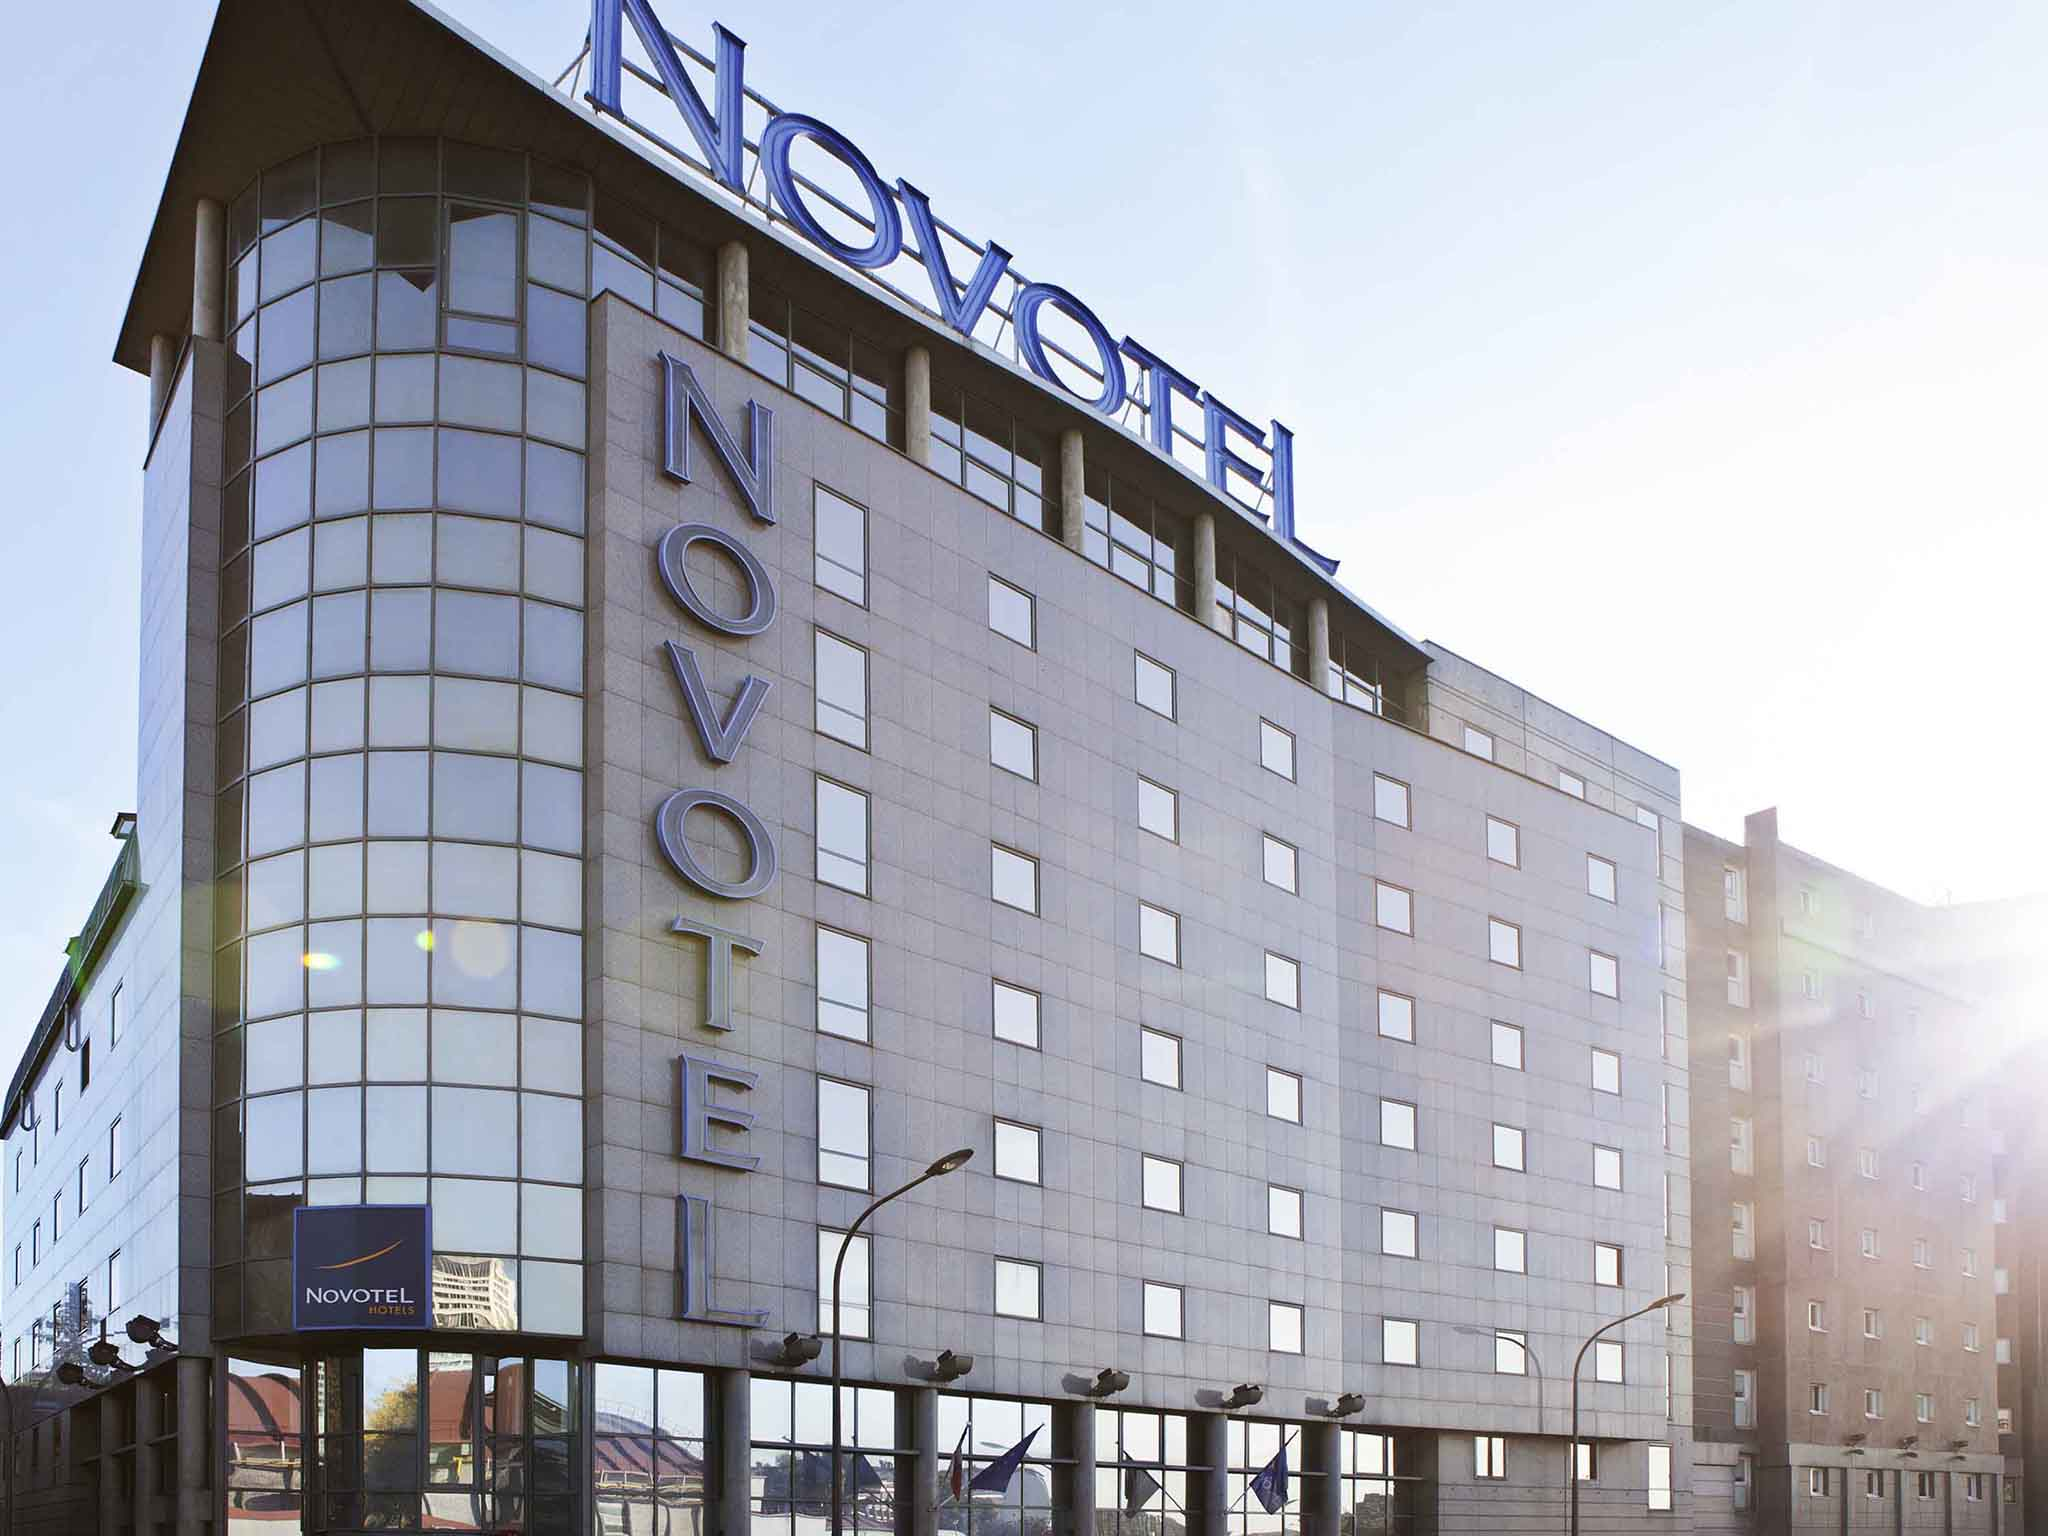 Hotel in le kremlin bicetre novotel paris 13 porte d 39 italie - Novotel paris porte d italie ...